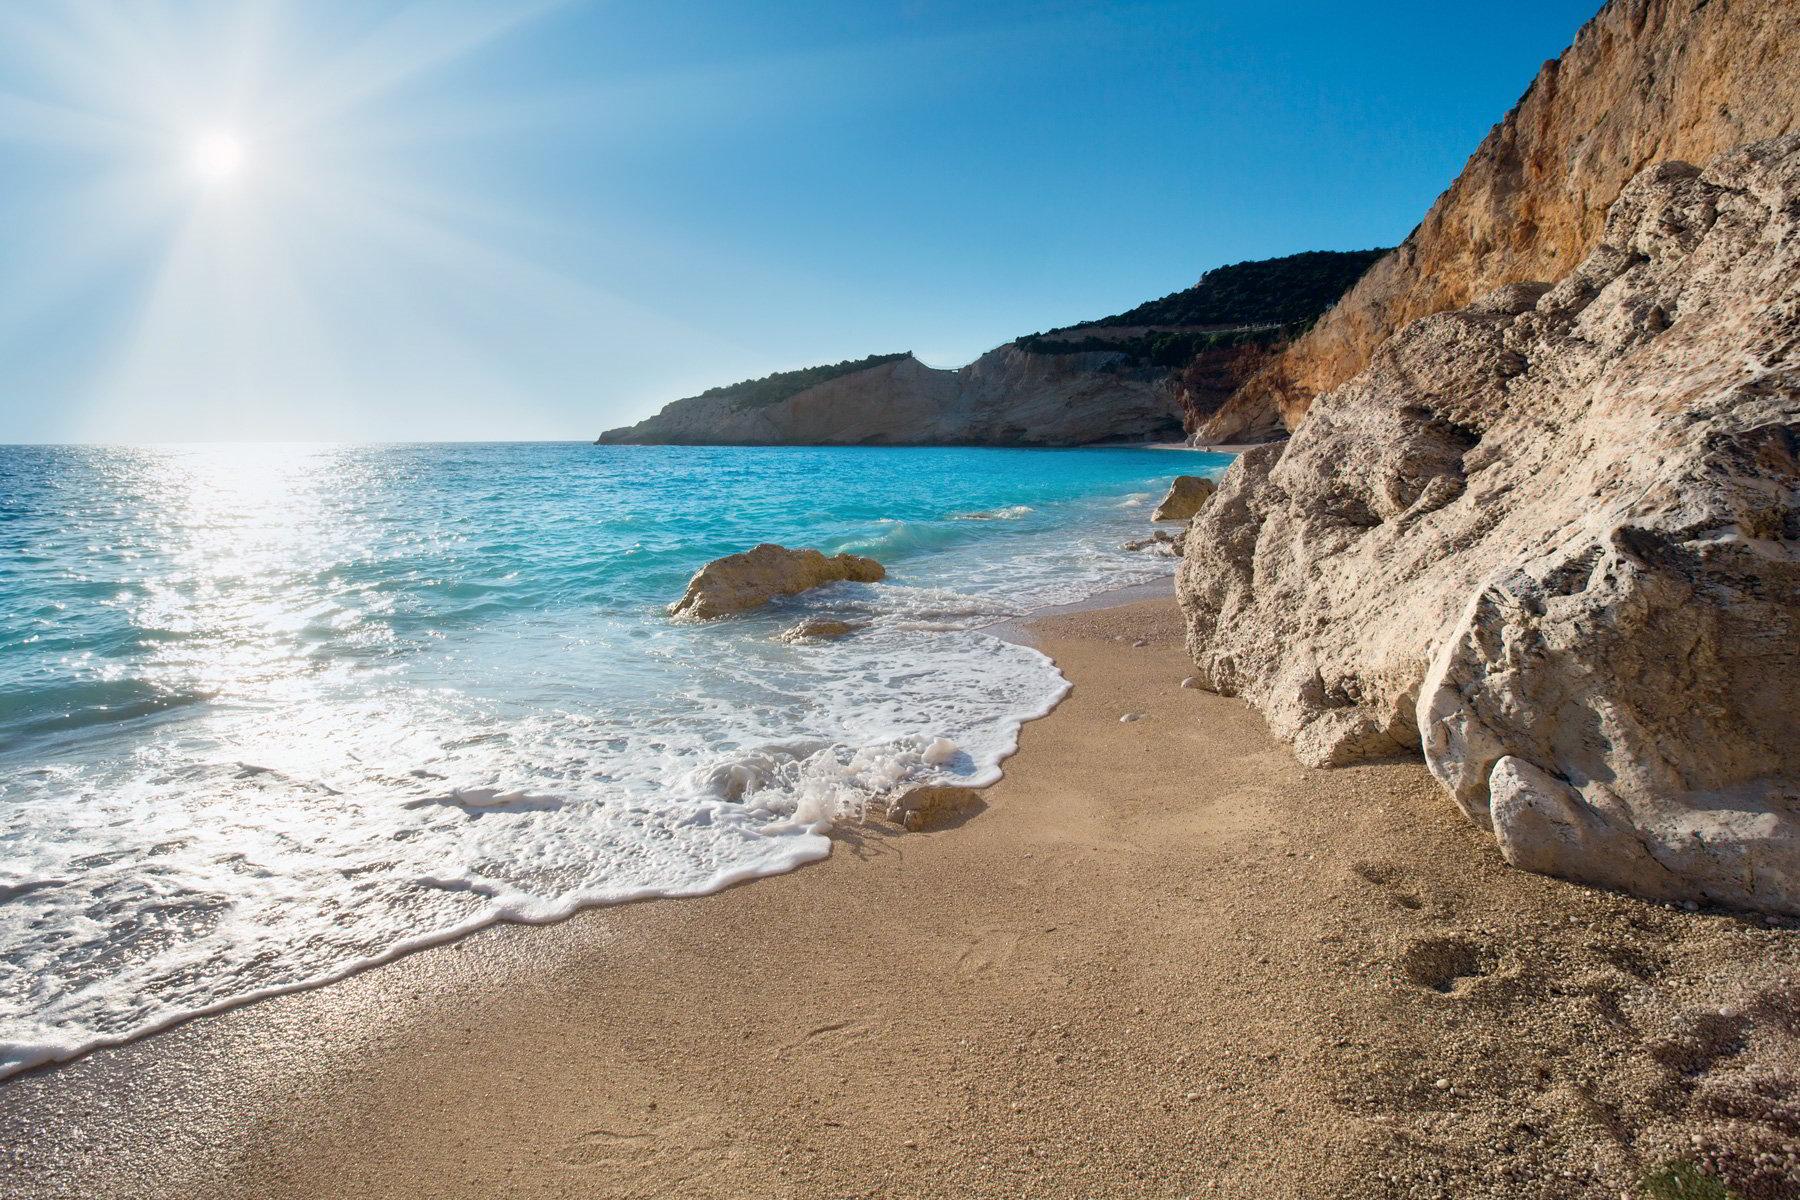 exotic-beach-during-summer.jpg